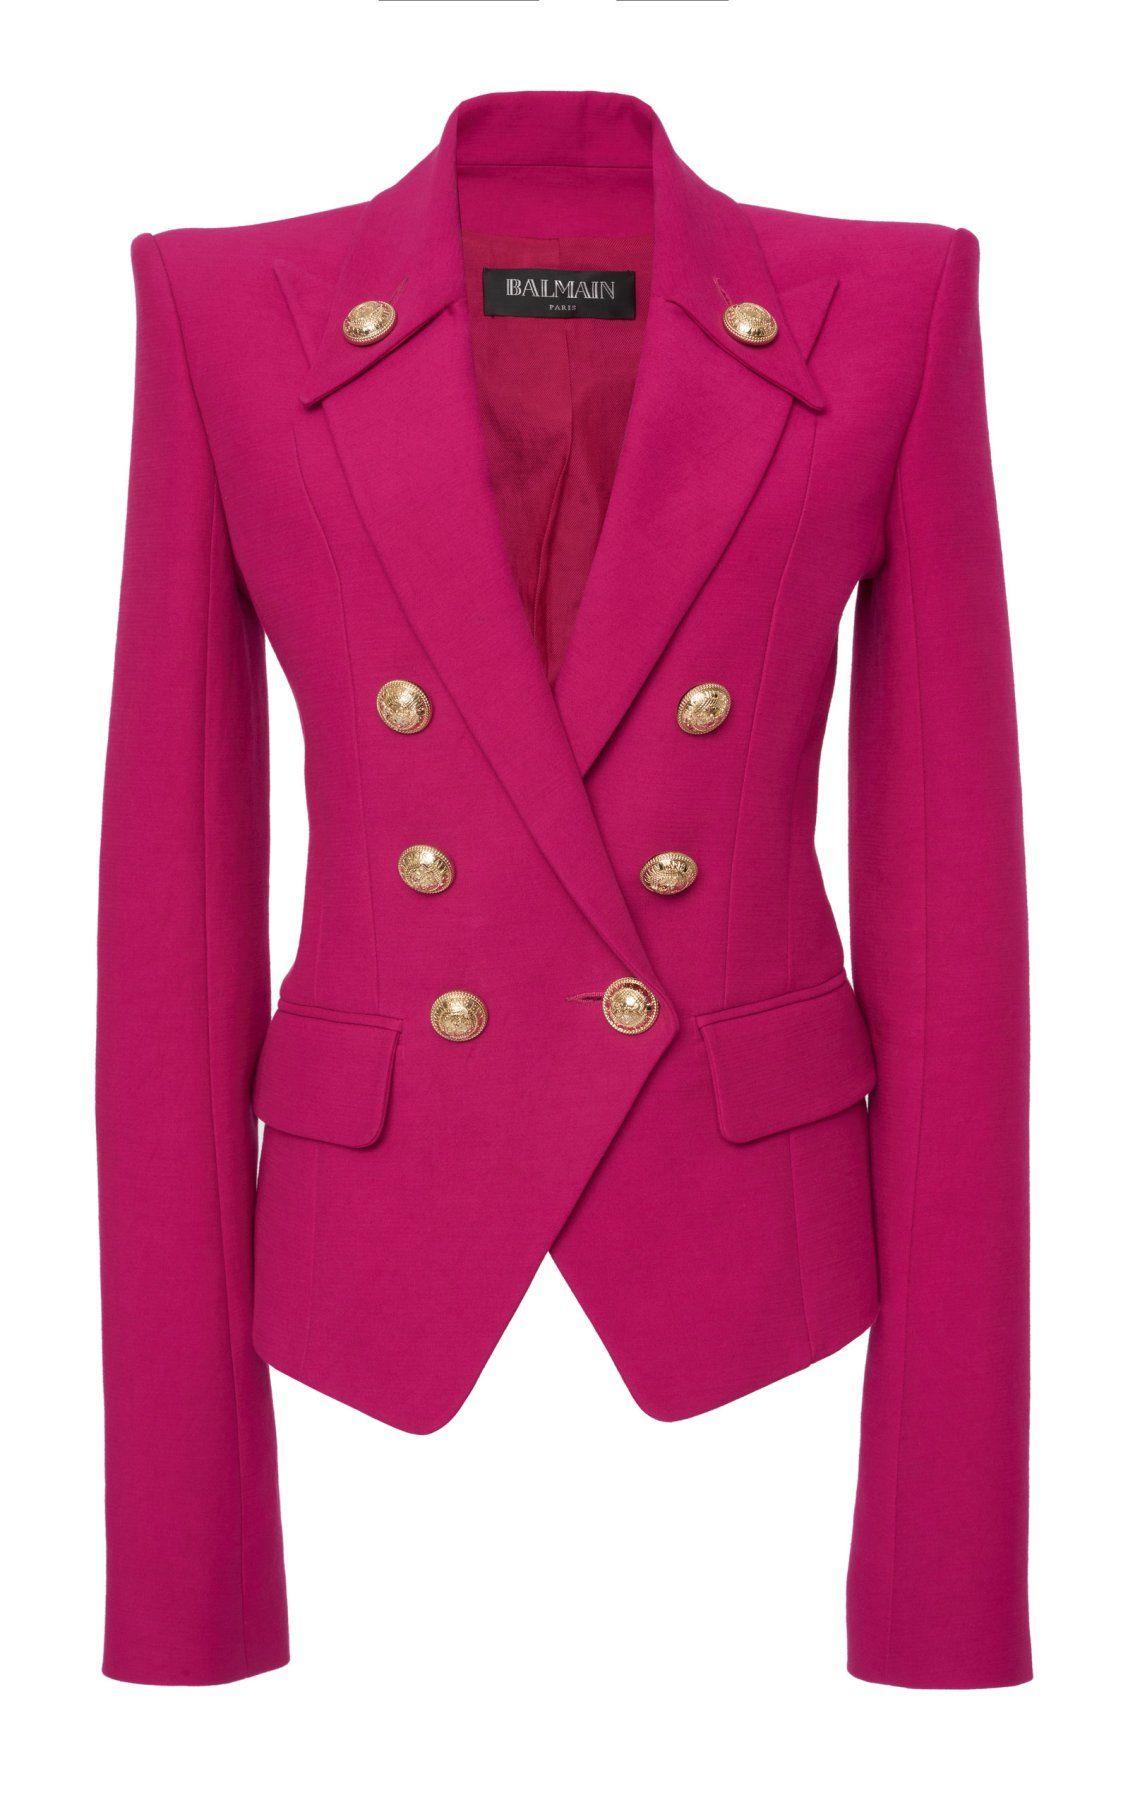 366c759d2a Fitted Peak Lapel Cotton Jacket by Balmain PF19